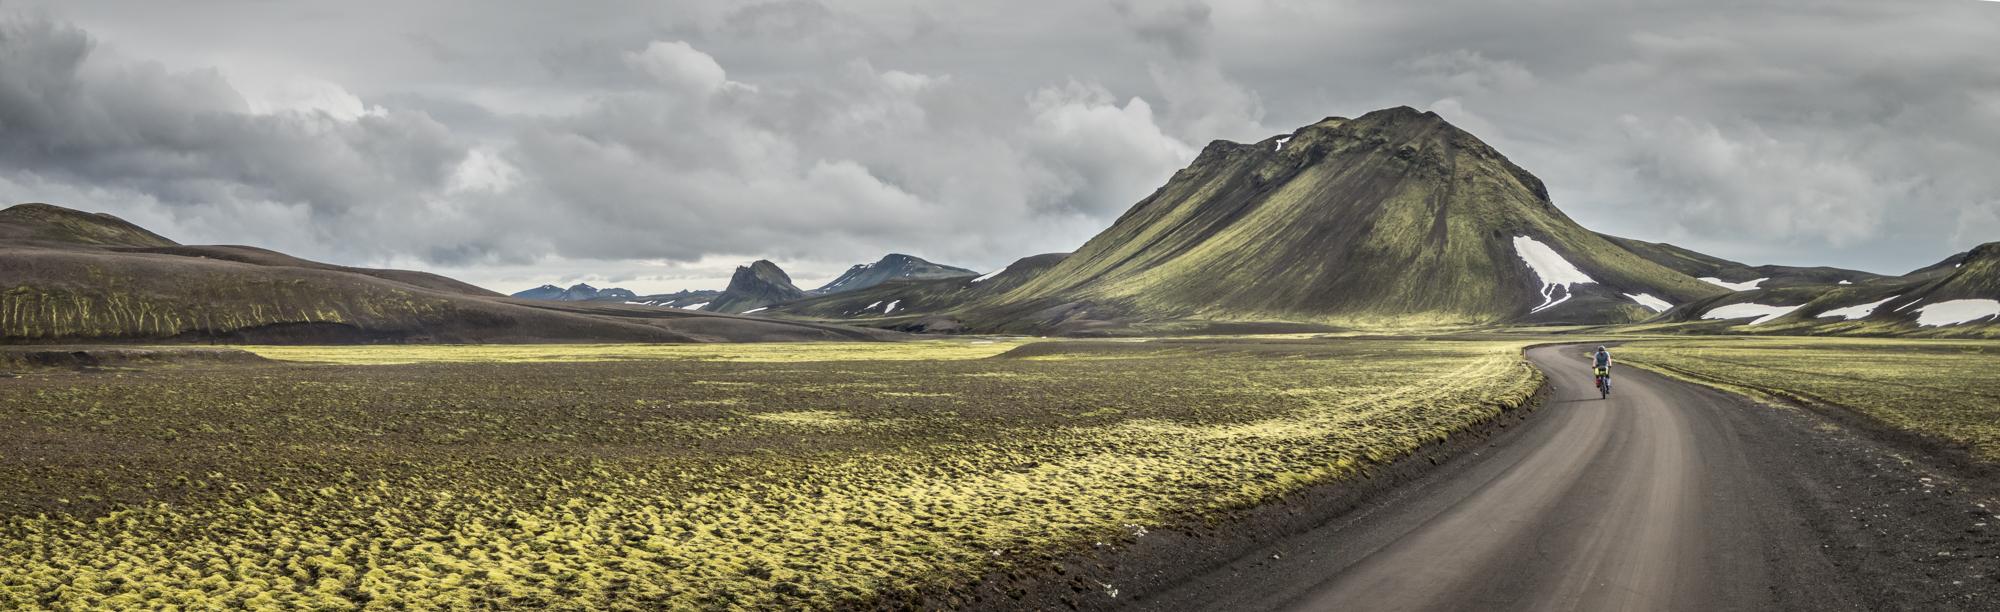 Joro Experiences Iceland Cycling